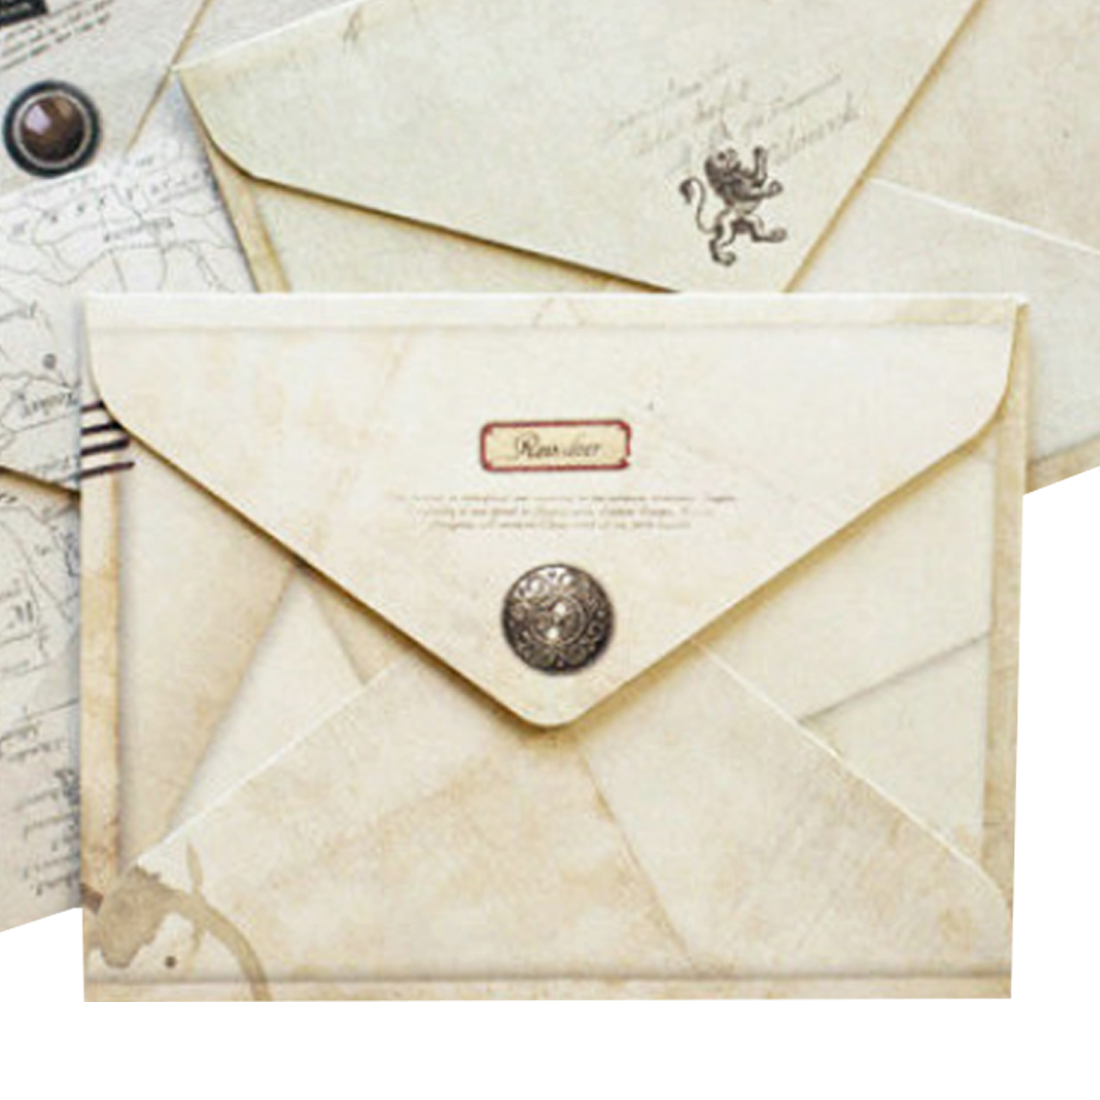 New 12 pcs/lot Mini Cute Ancien Paper Envelope Retro Vintage European Style For Card Scrapbooking Gift Diy Party Supplies